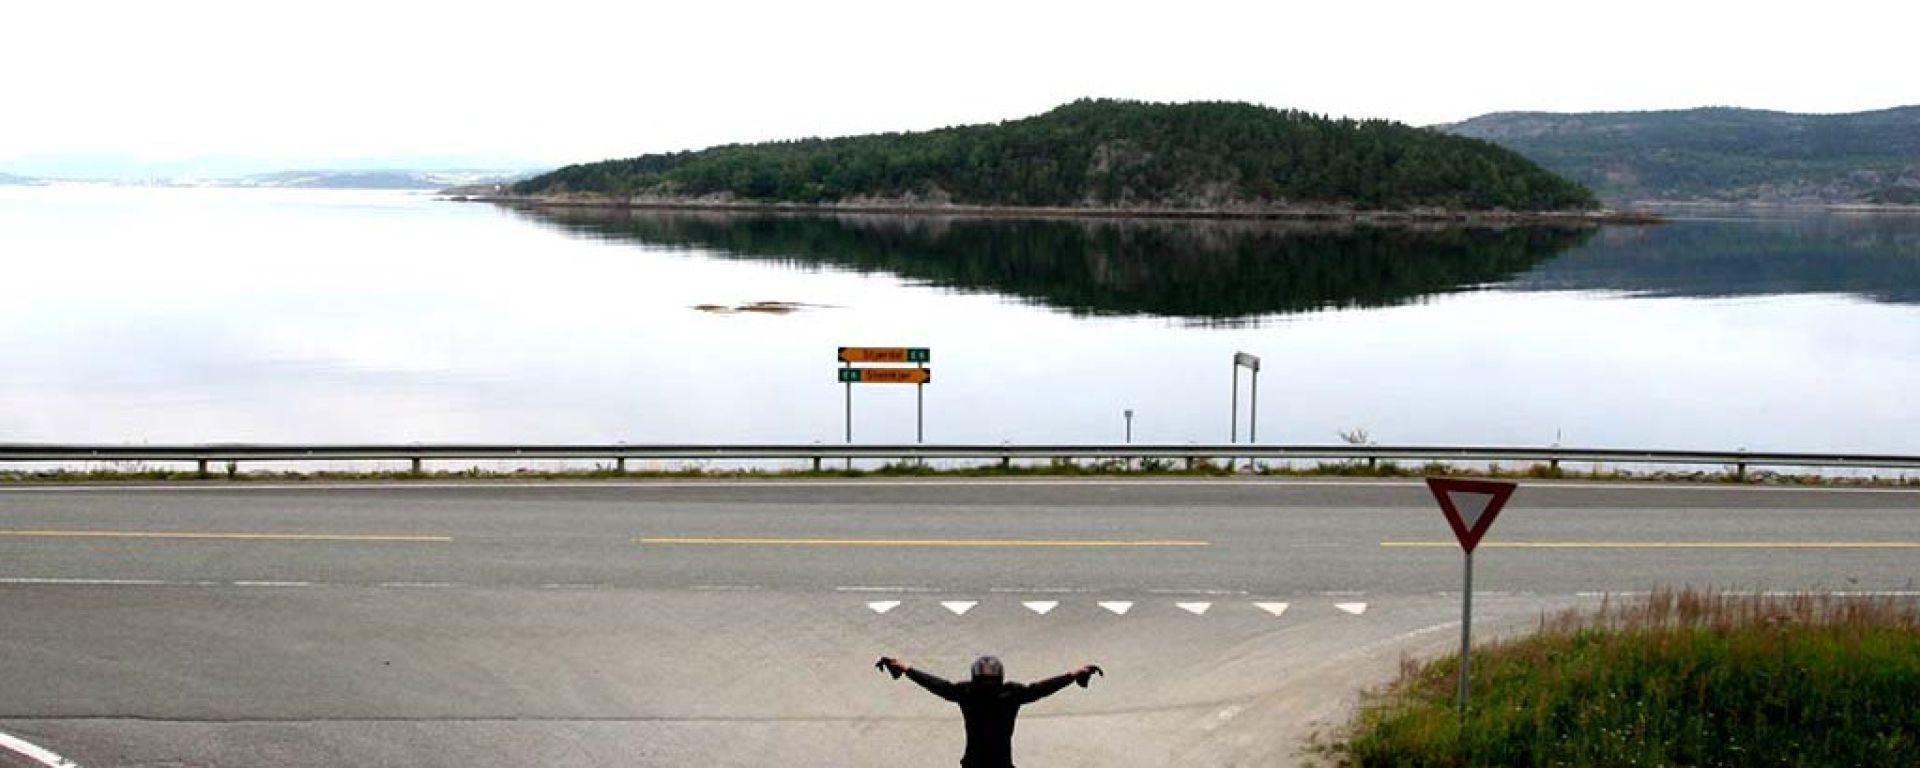 Raid Norge 2006 / Quarta tappa: Trondheim - Mo I Rana (429 km)